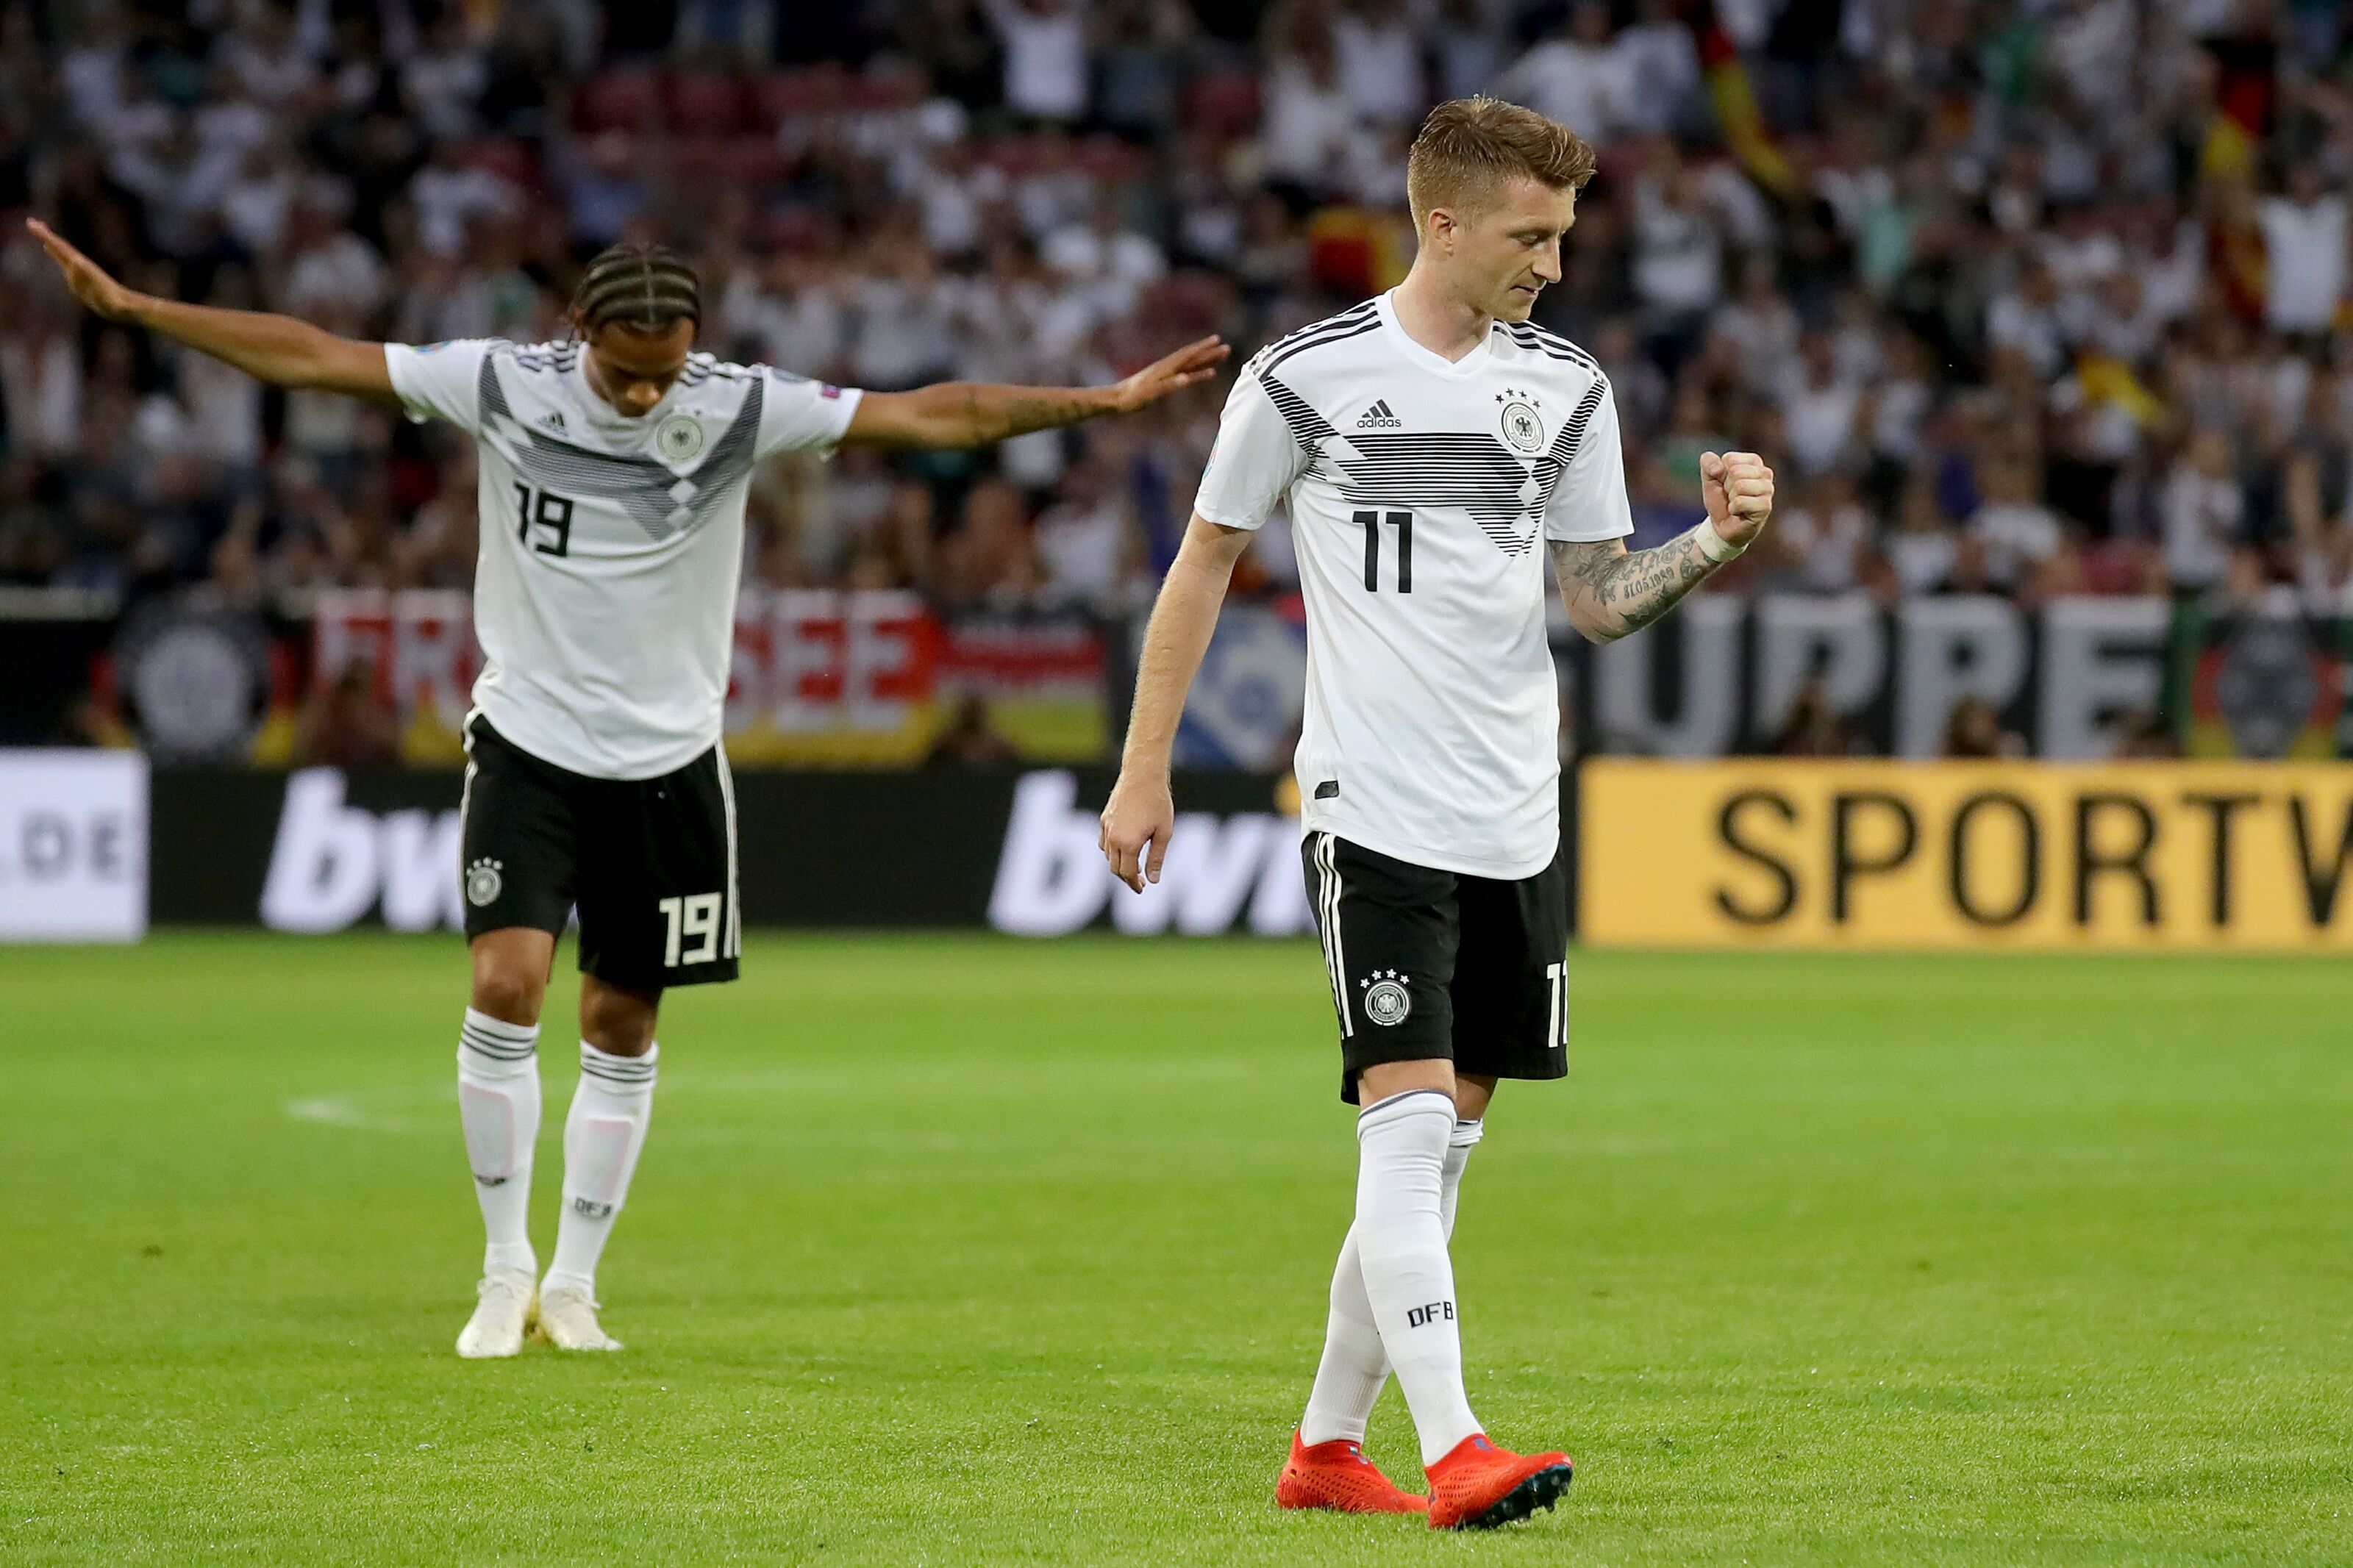 International round up: How did Borussia Dortmund players fare on International duty